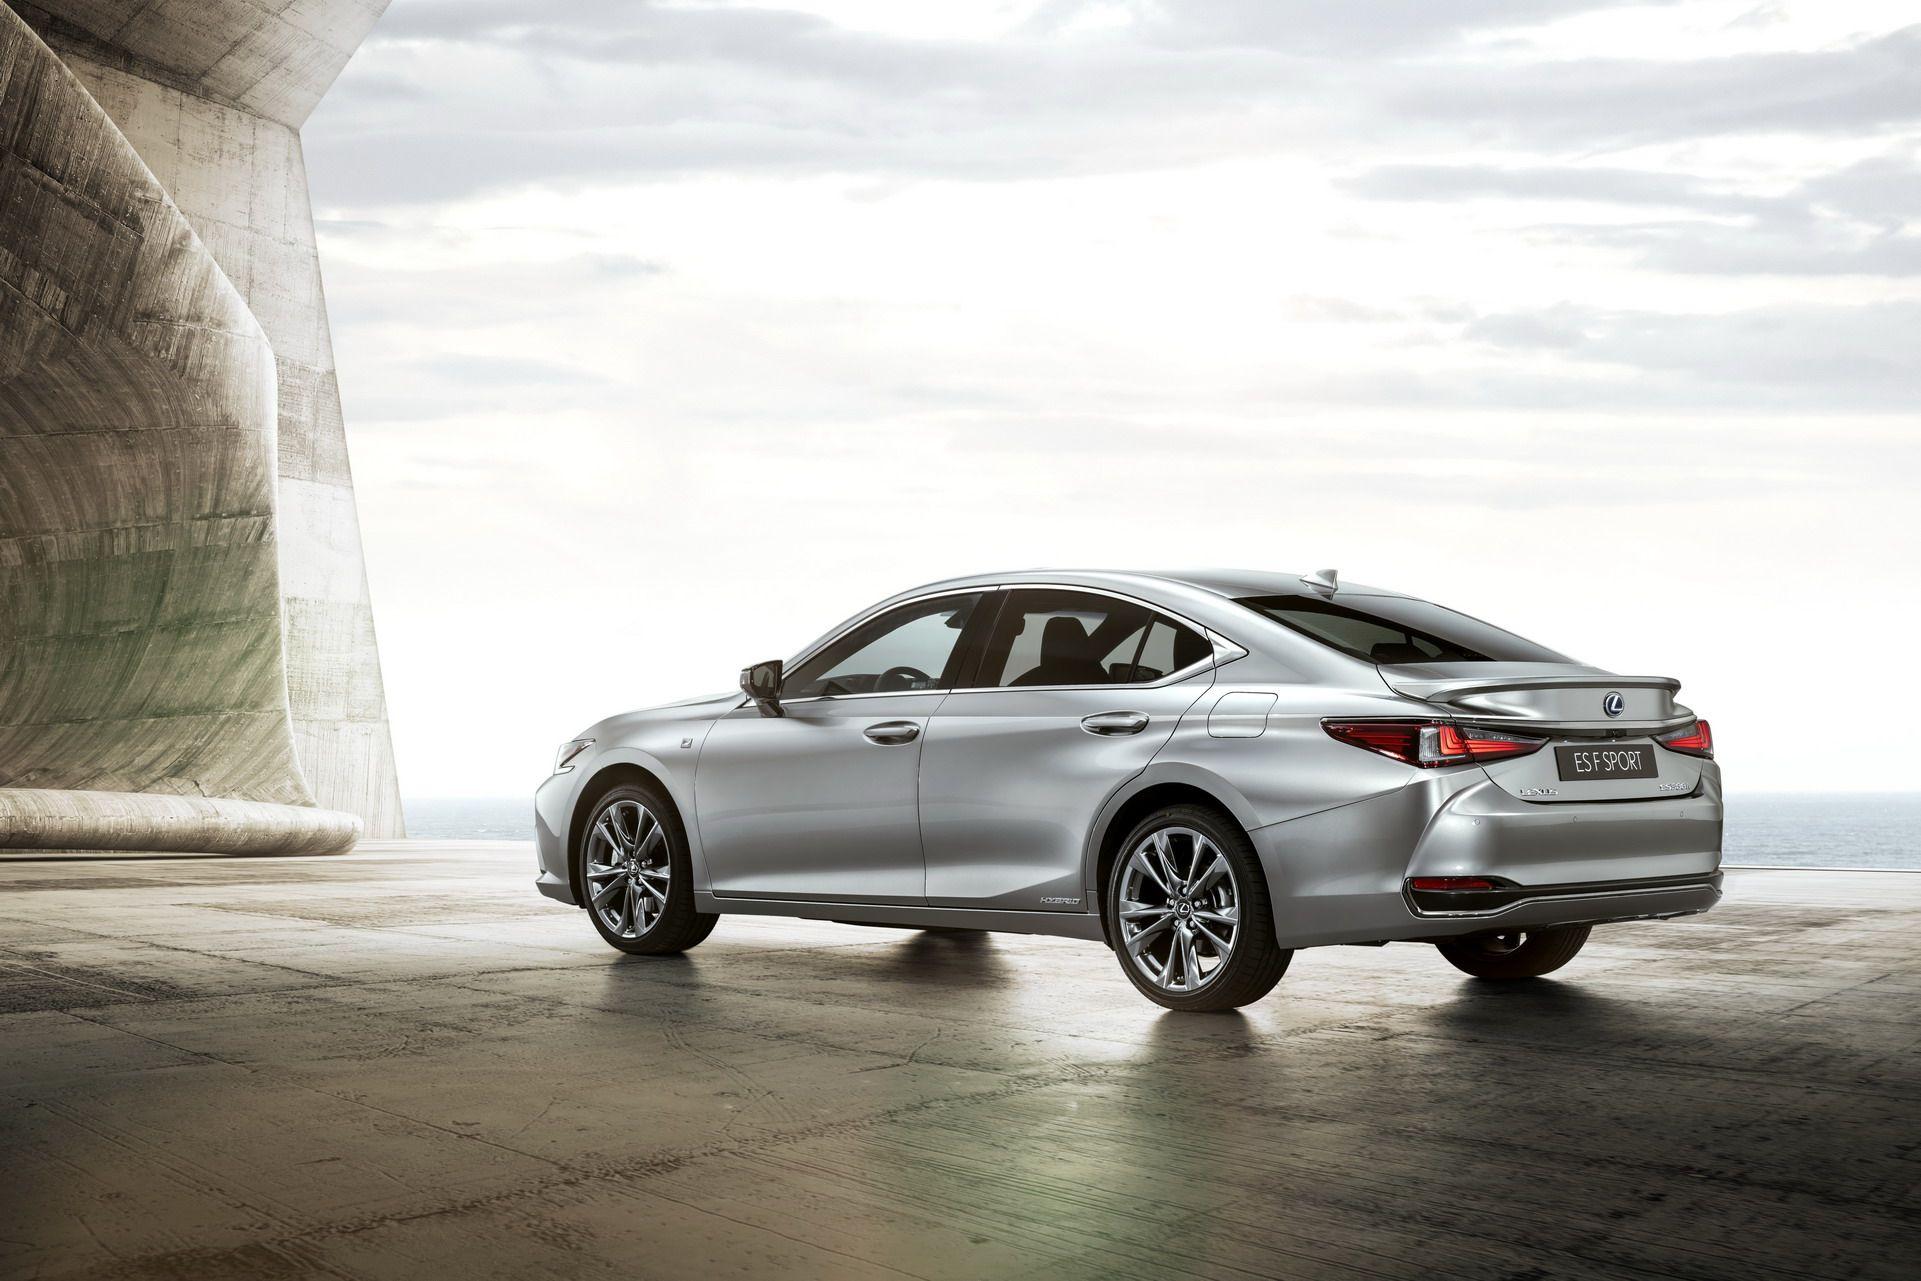 2019-Lexus-ES-EU10